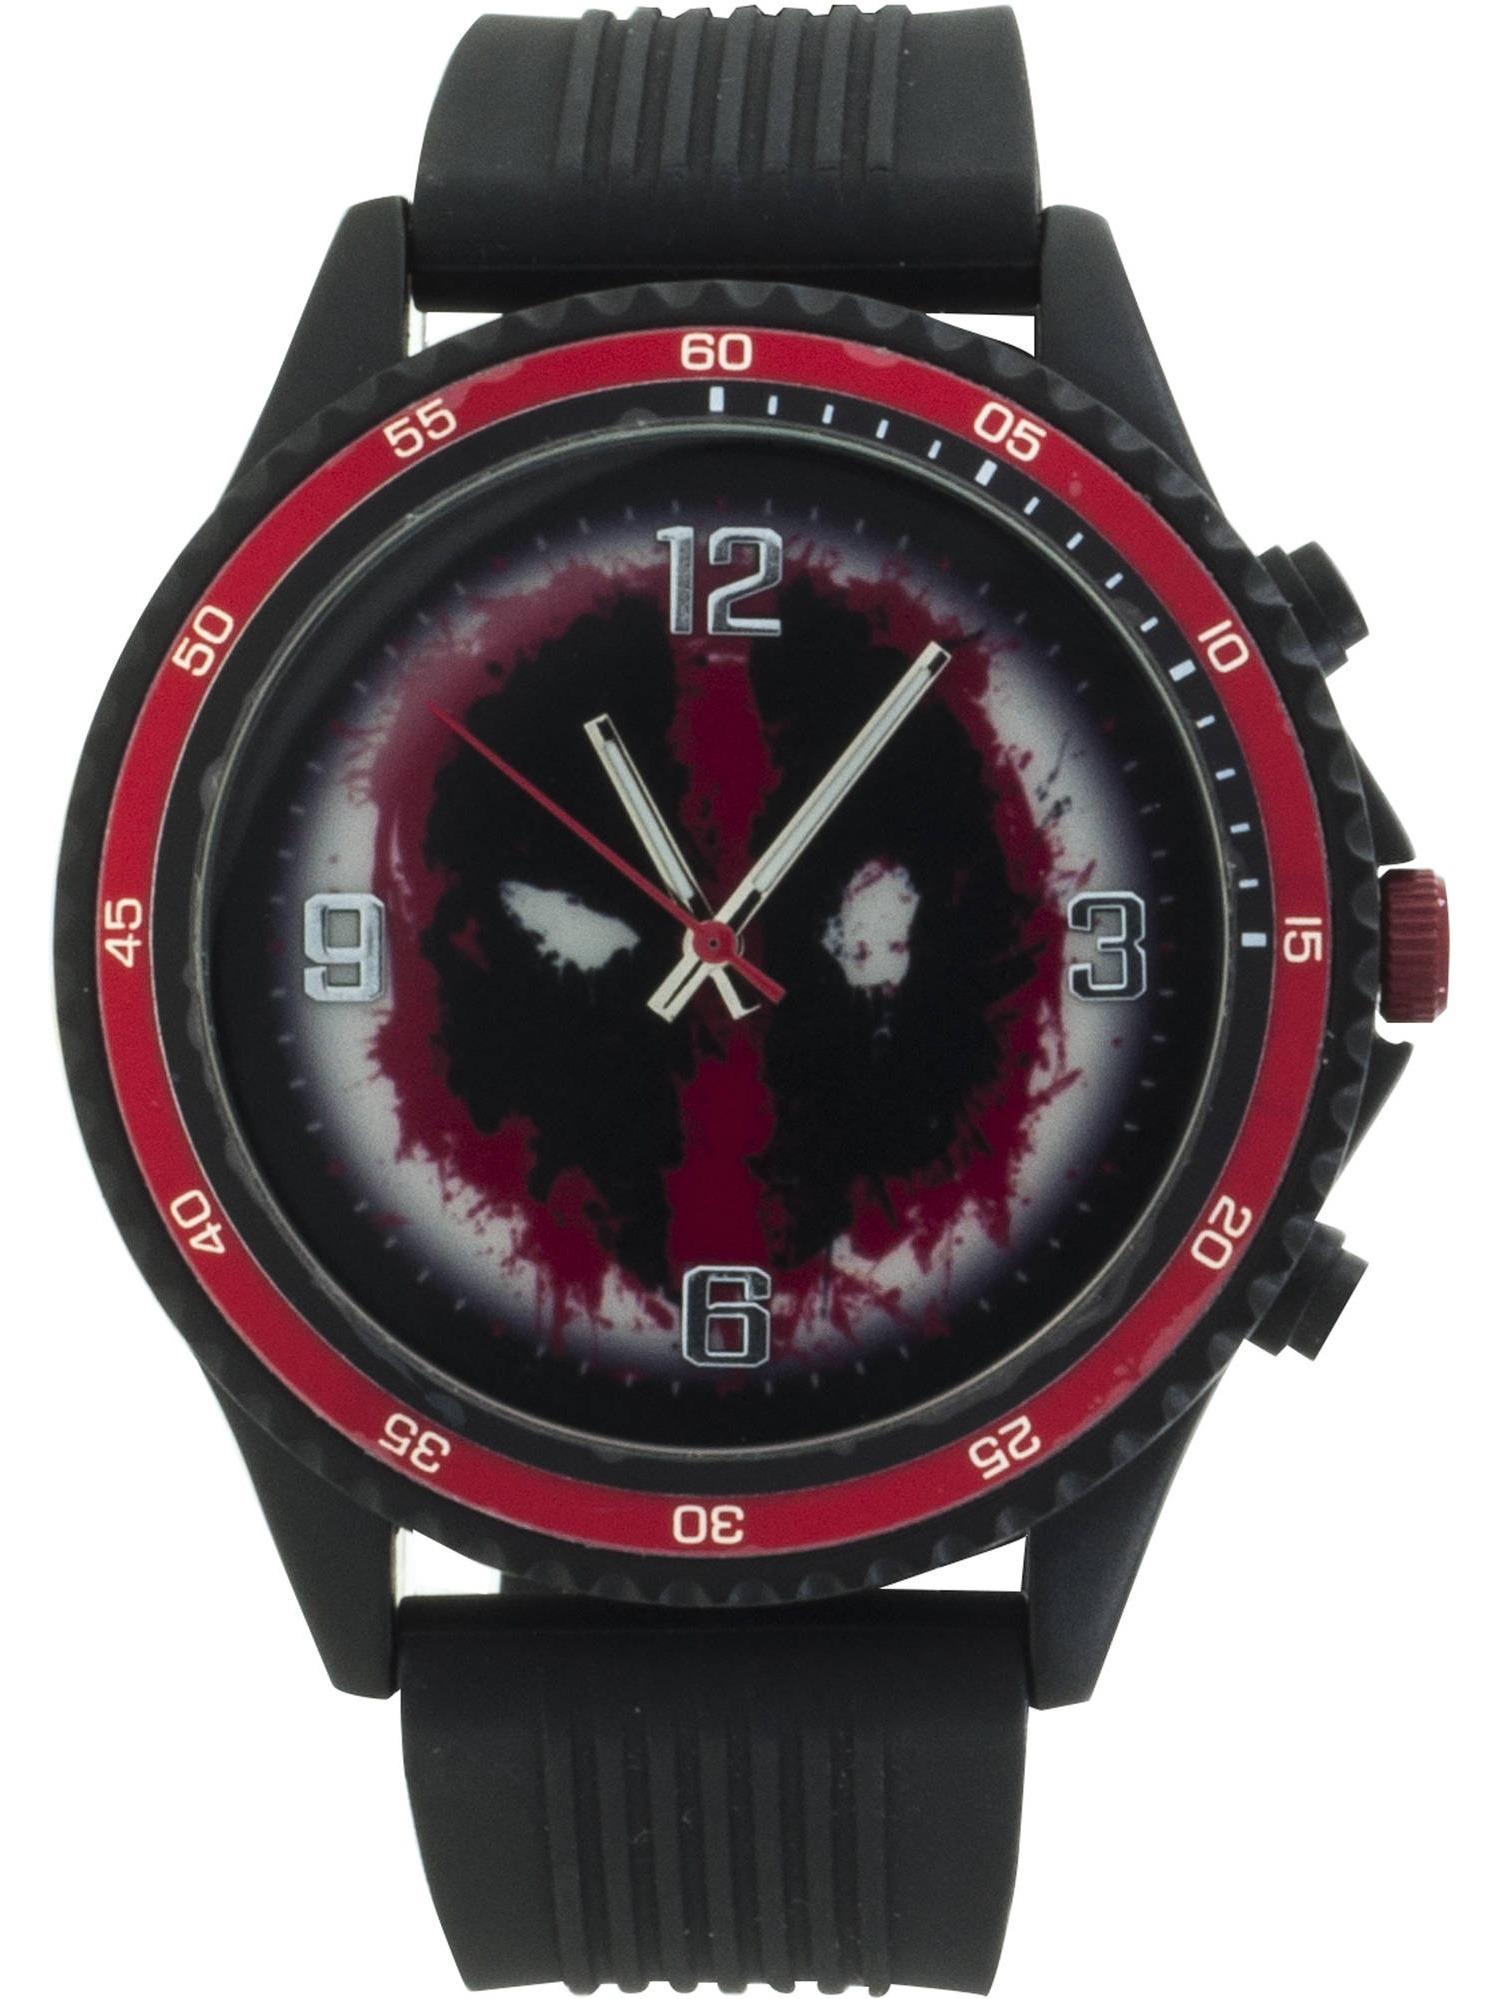 Marvel Deadpool Men's Analog Watch, Black Band